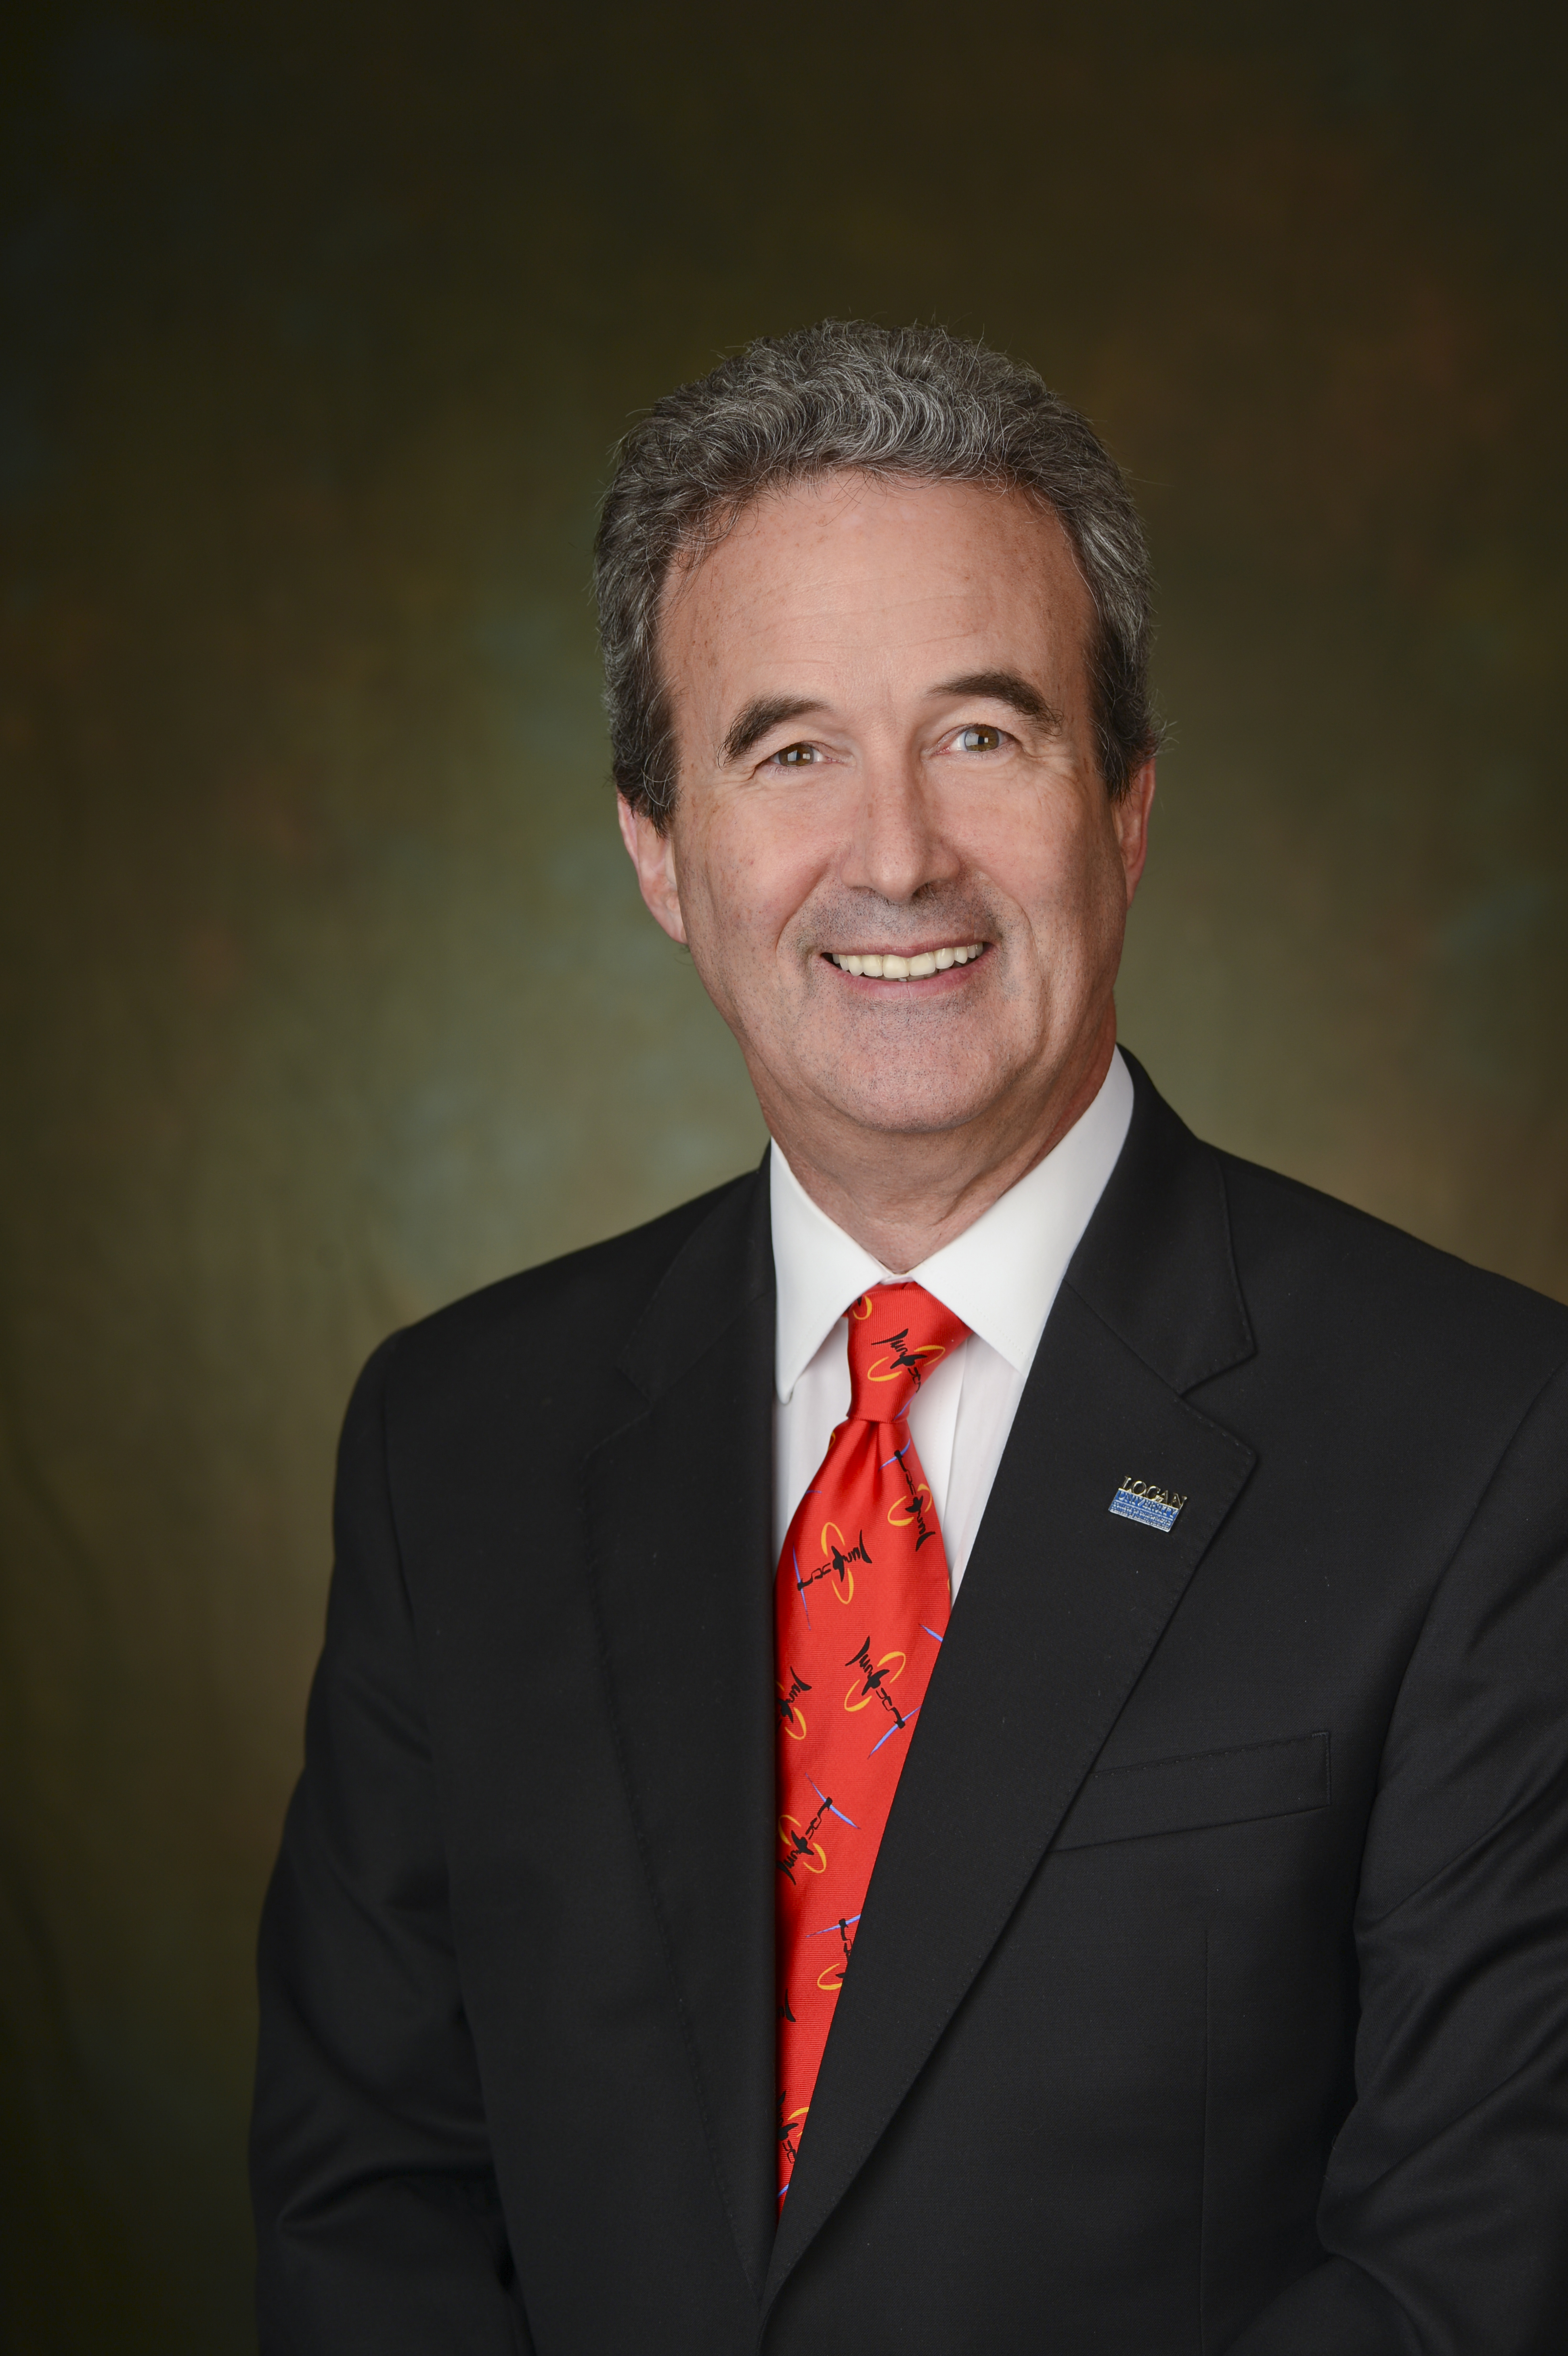 Dr. Christophe B. Dean